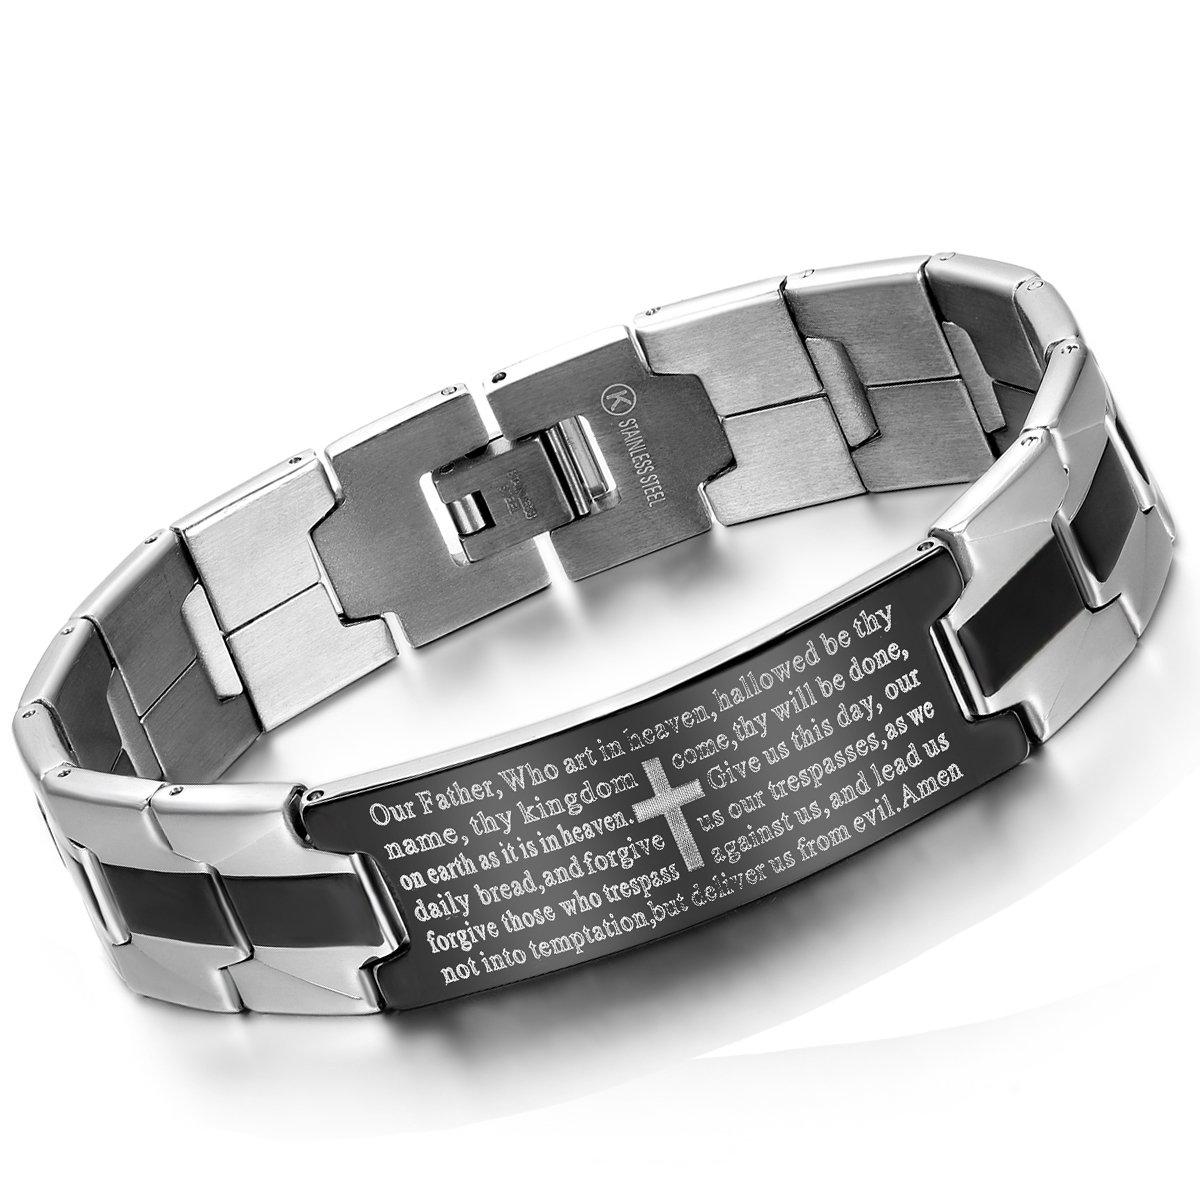 Flongo Men's Vintage Stainless Steel Black Cross English Bible Lords Prayer Link Wrist Bracelet for Men 8.1 inch FLG04472